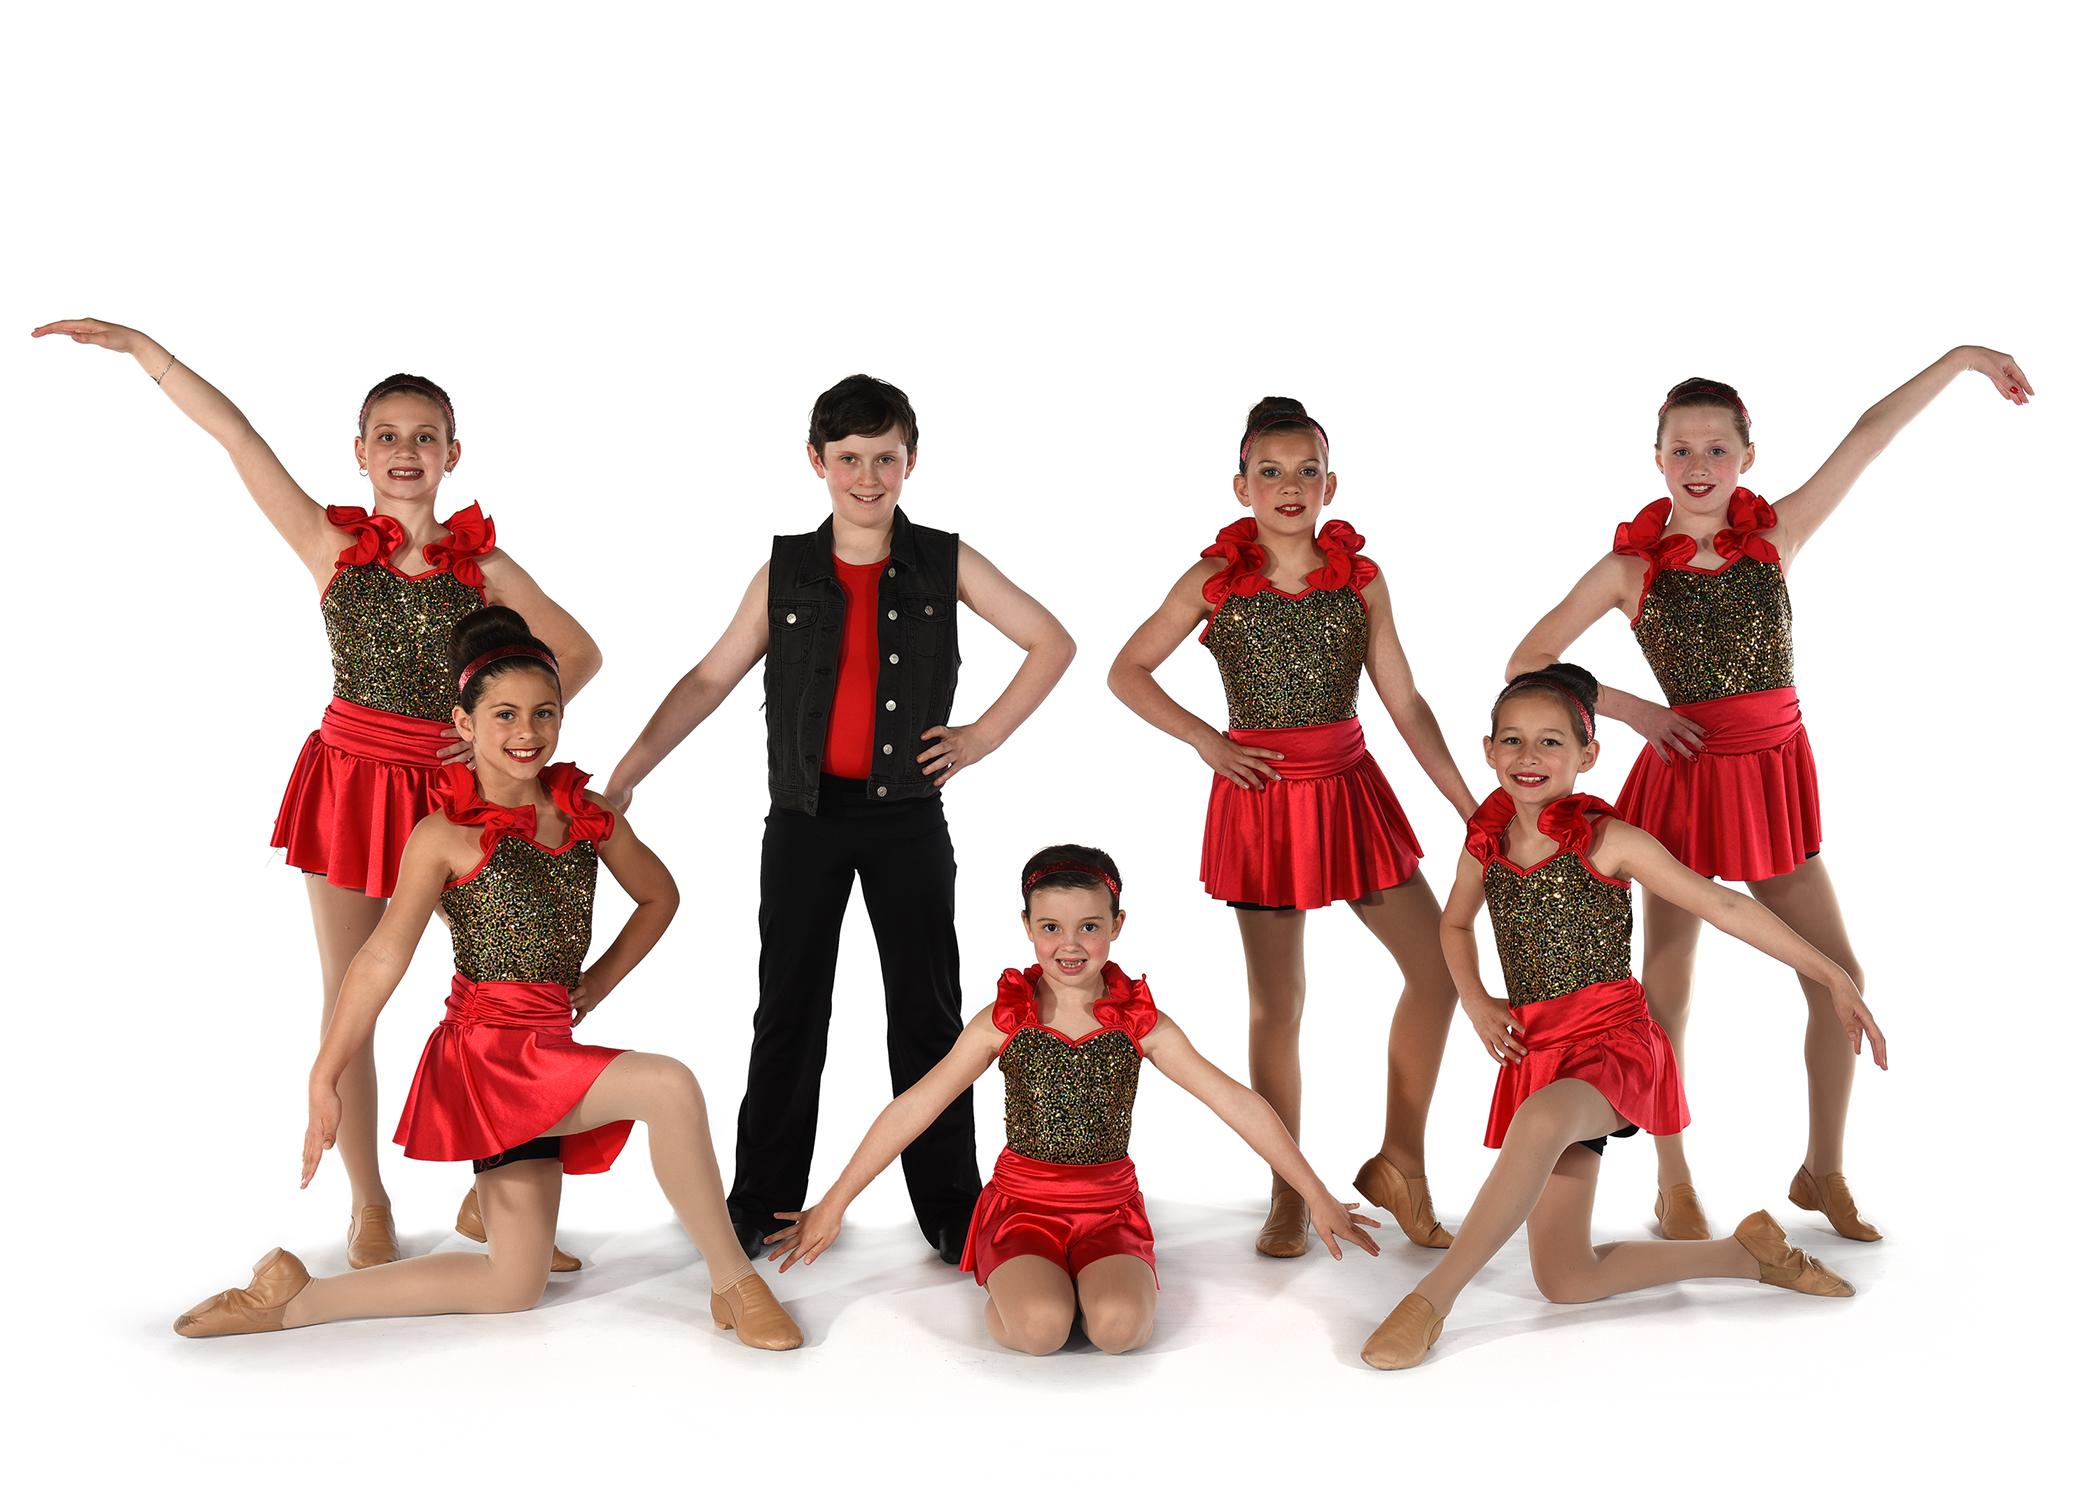 Gallery Dance Expressions De Danse